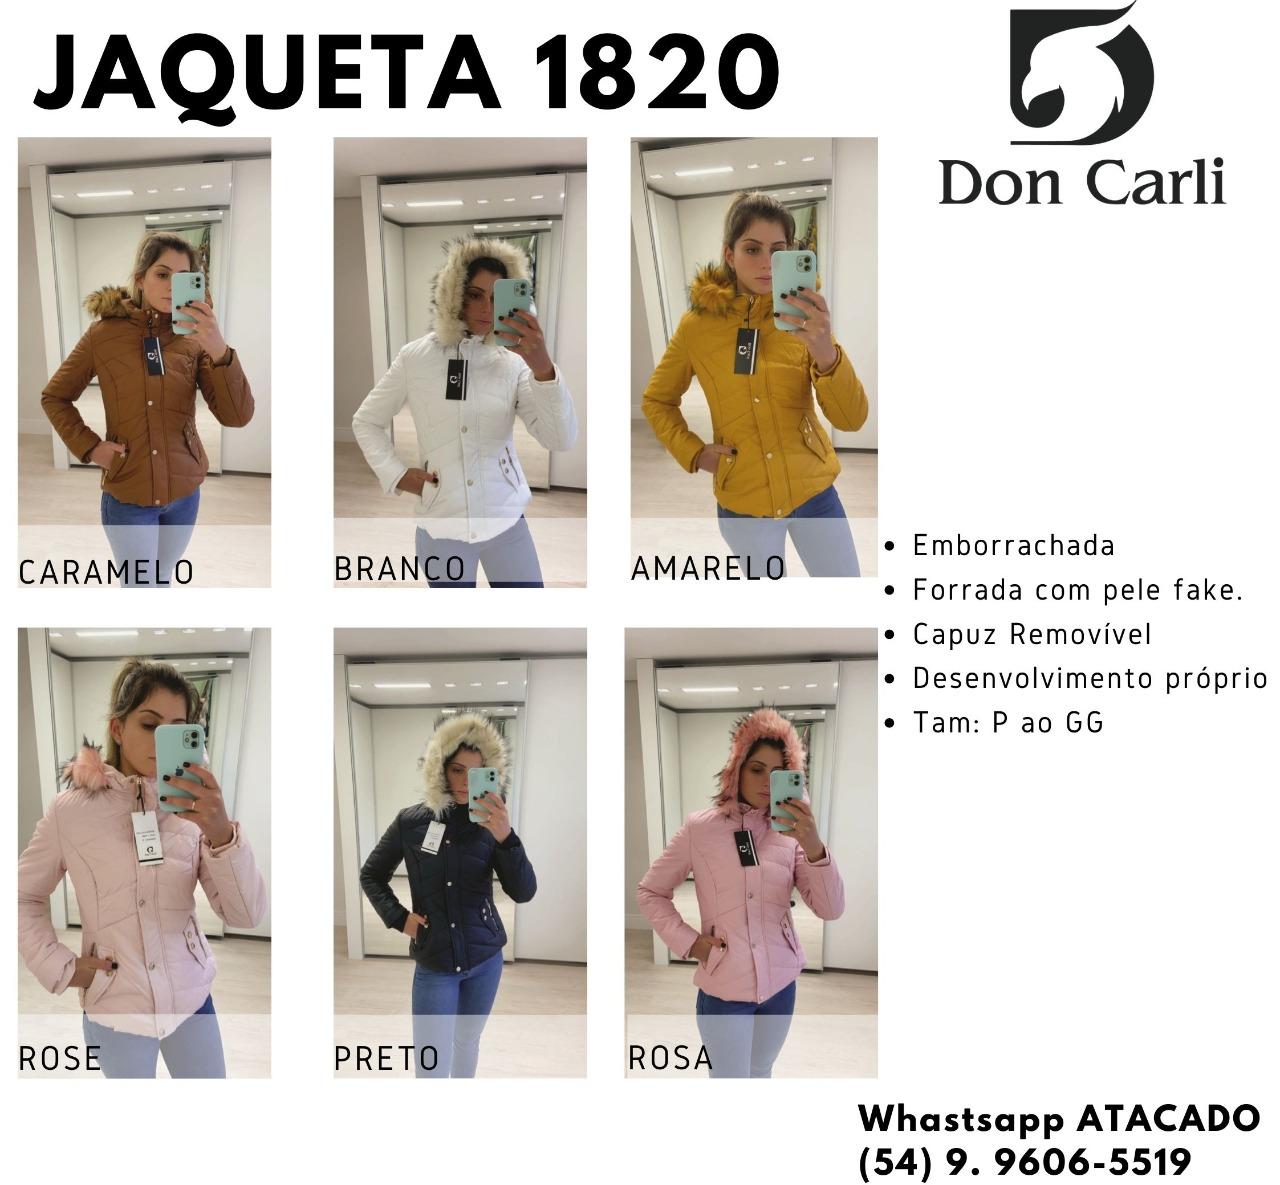 Jaqueta Don Carli 1820